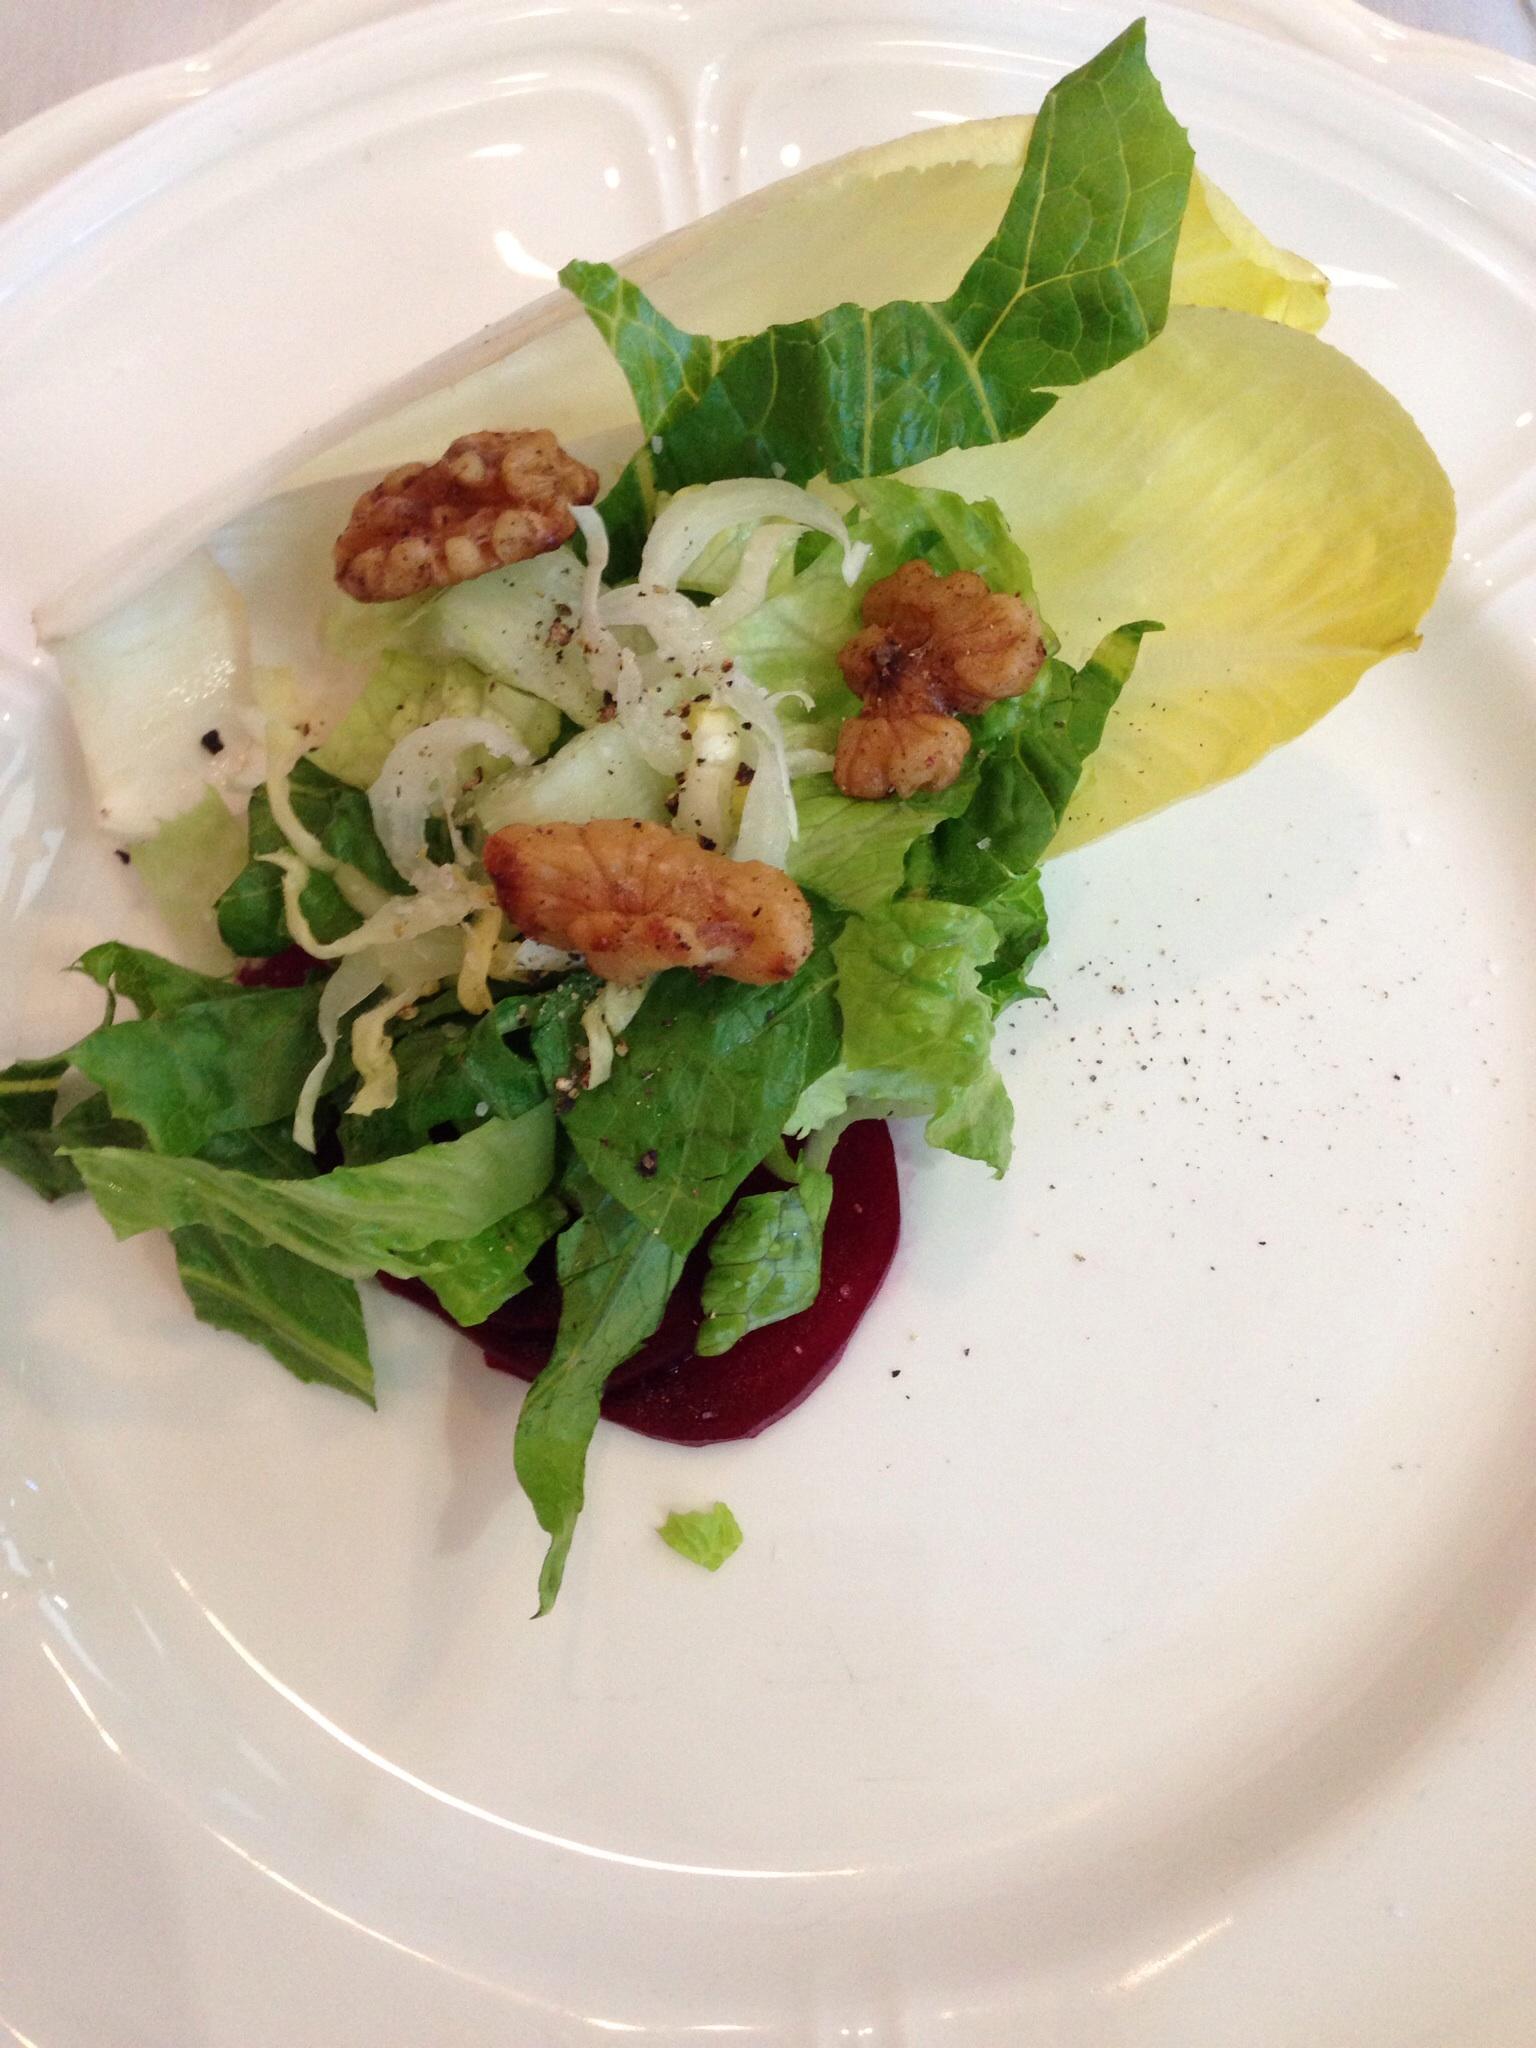 Endive & Romaine Salad